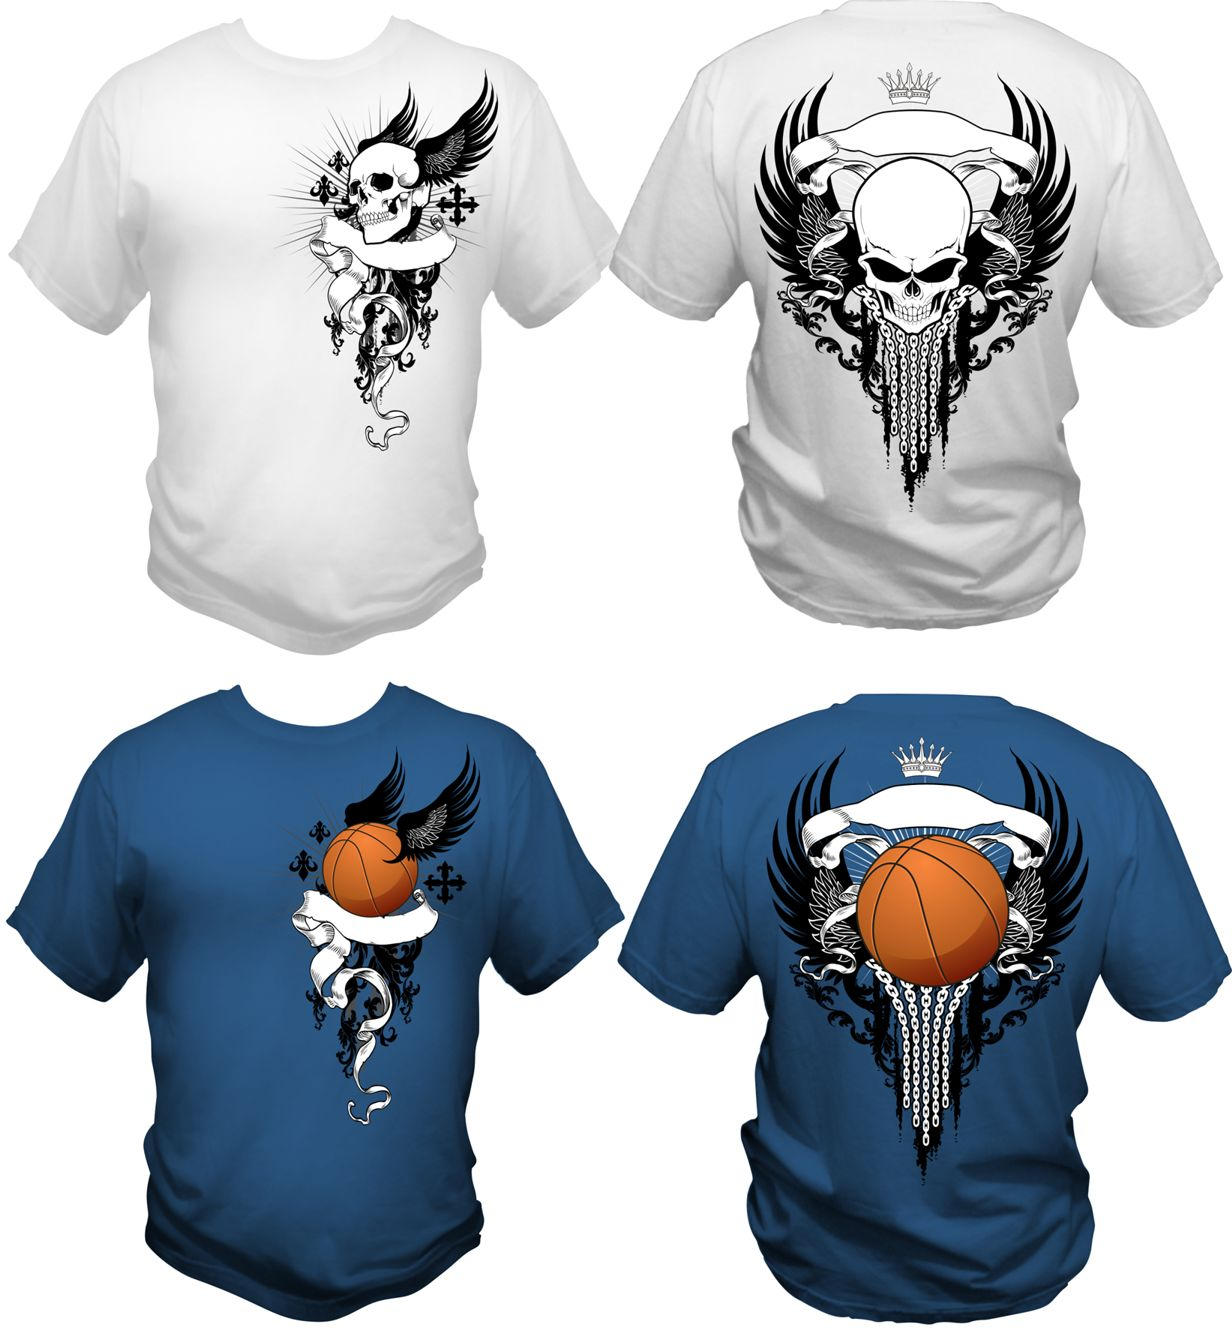 Free T-Shirt Design by artamp